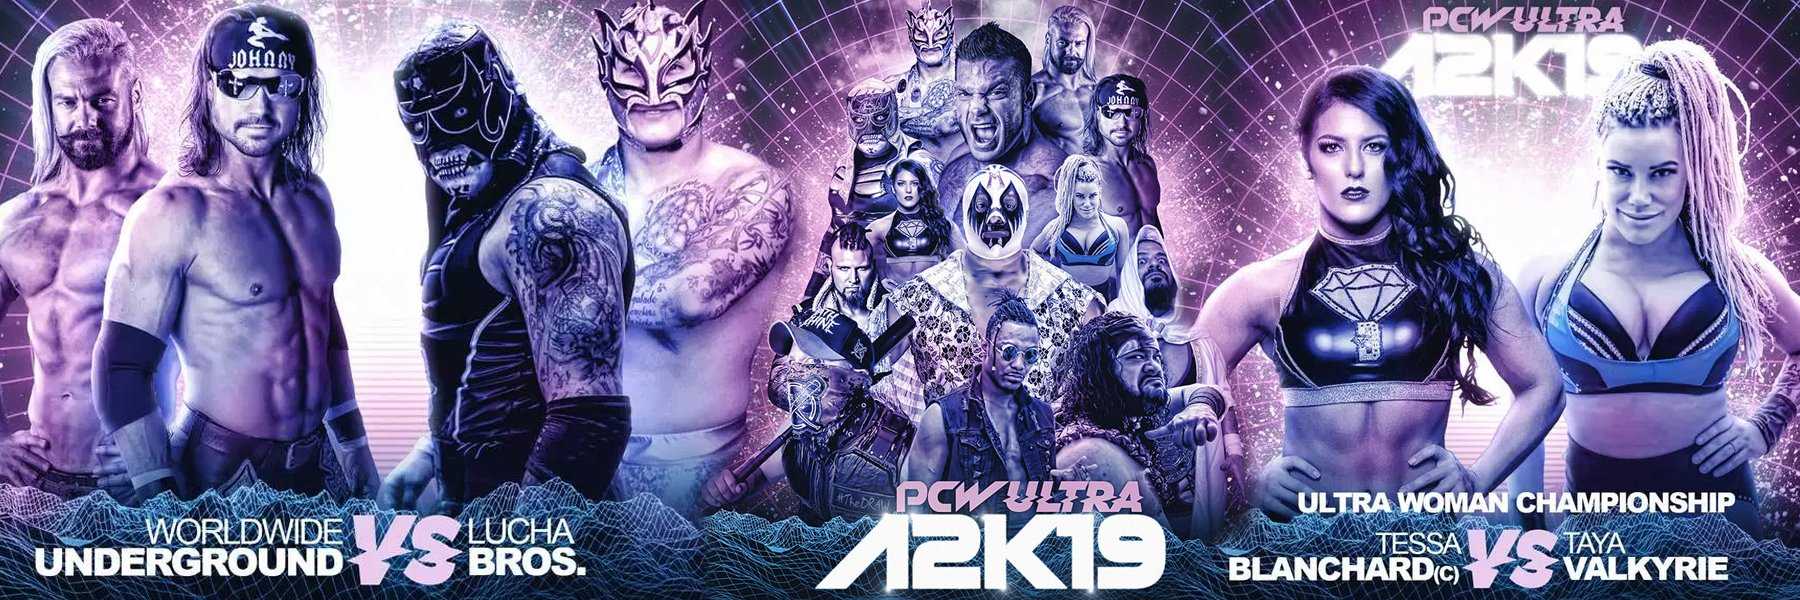 Watch PCW Ultra: A2K19 - Taya Valkyrie vs Tessa Blanchard, Lucha Bros